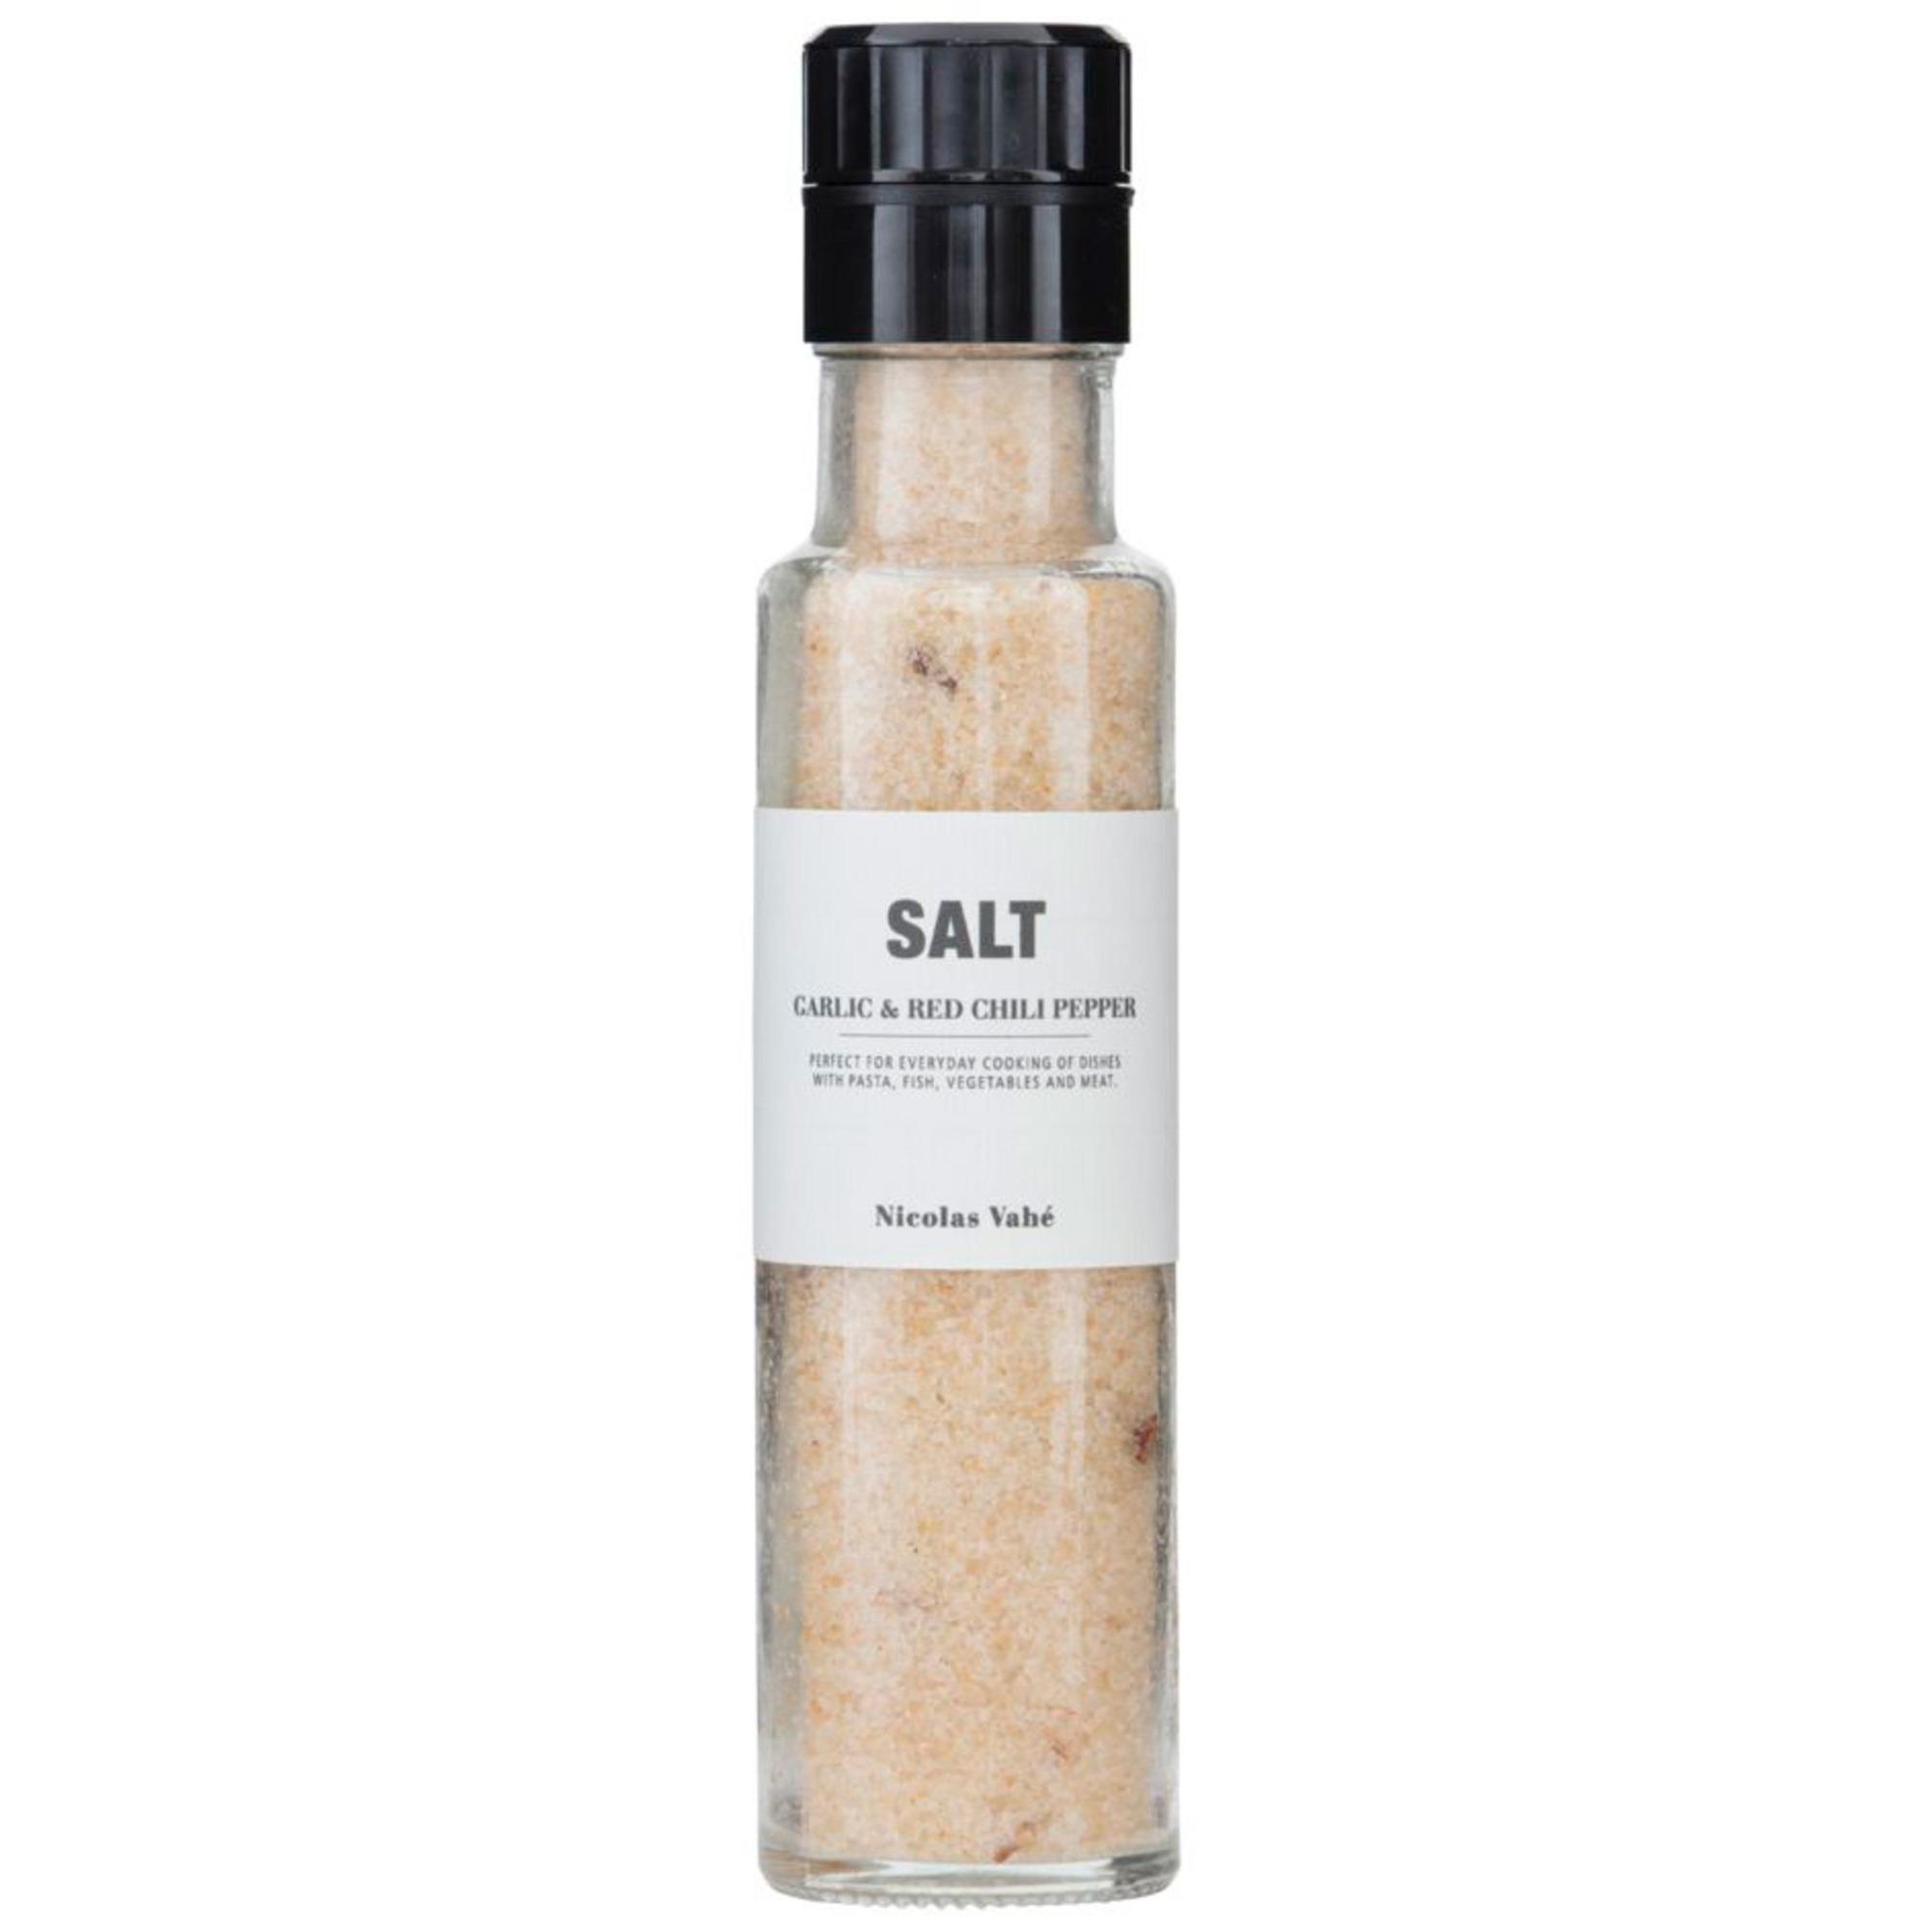 Nicolas Vahé Salt m. Vitlök och Röd Chili peppar